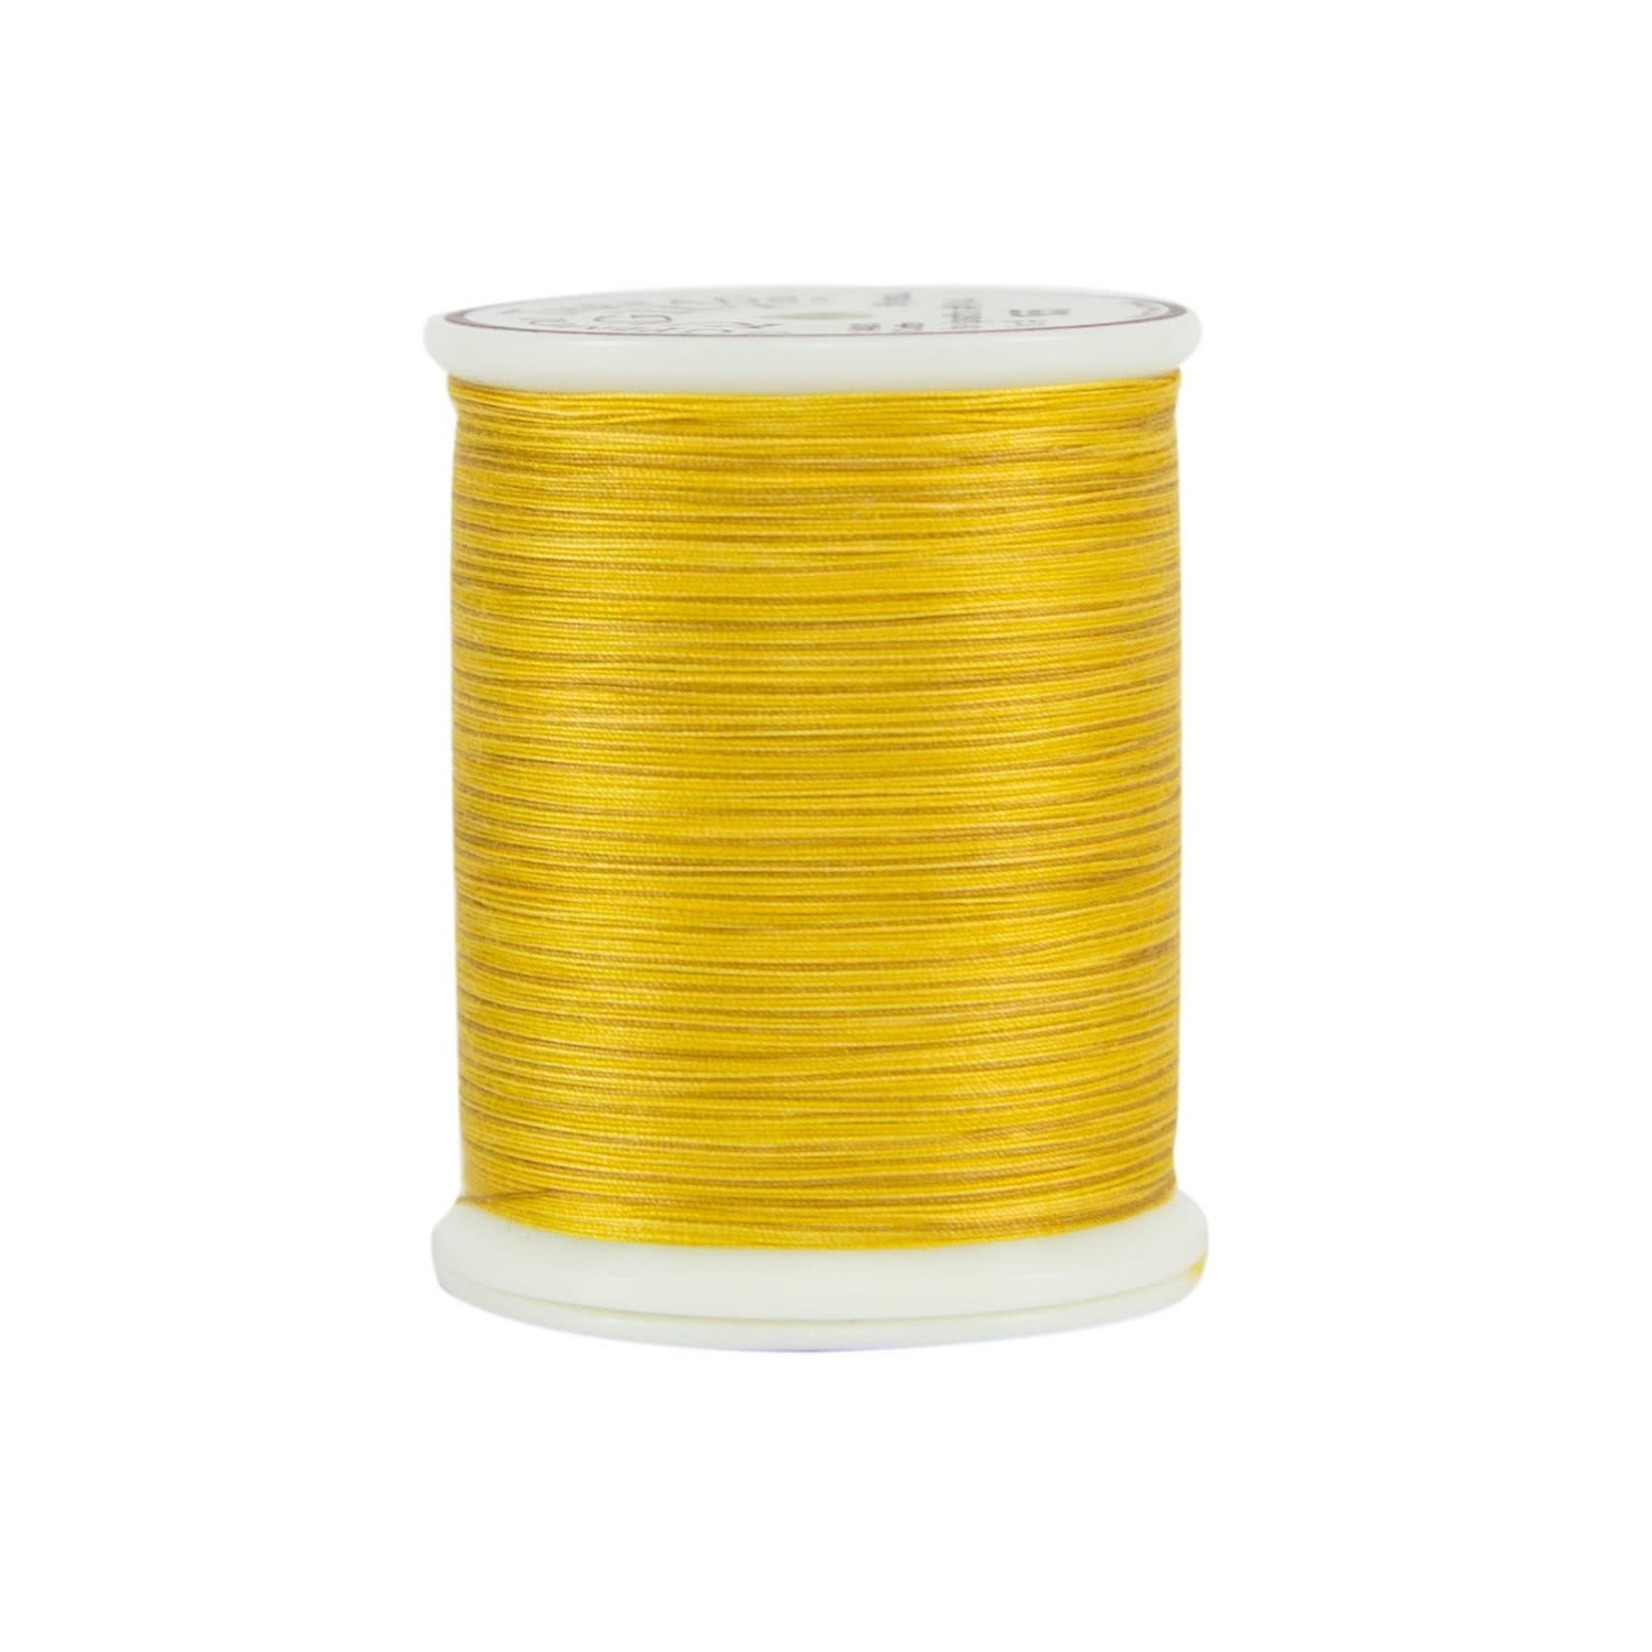 Superior Threads King Tut - #40 - 457 m - 0955 Sunflowers